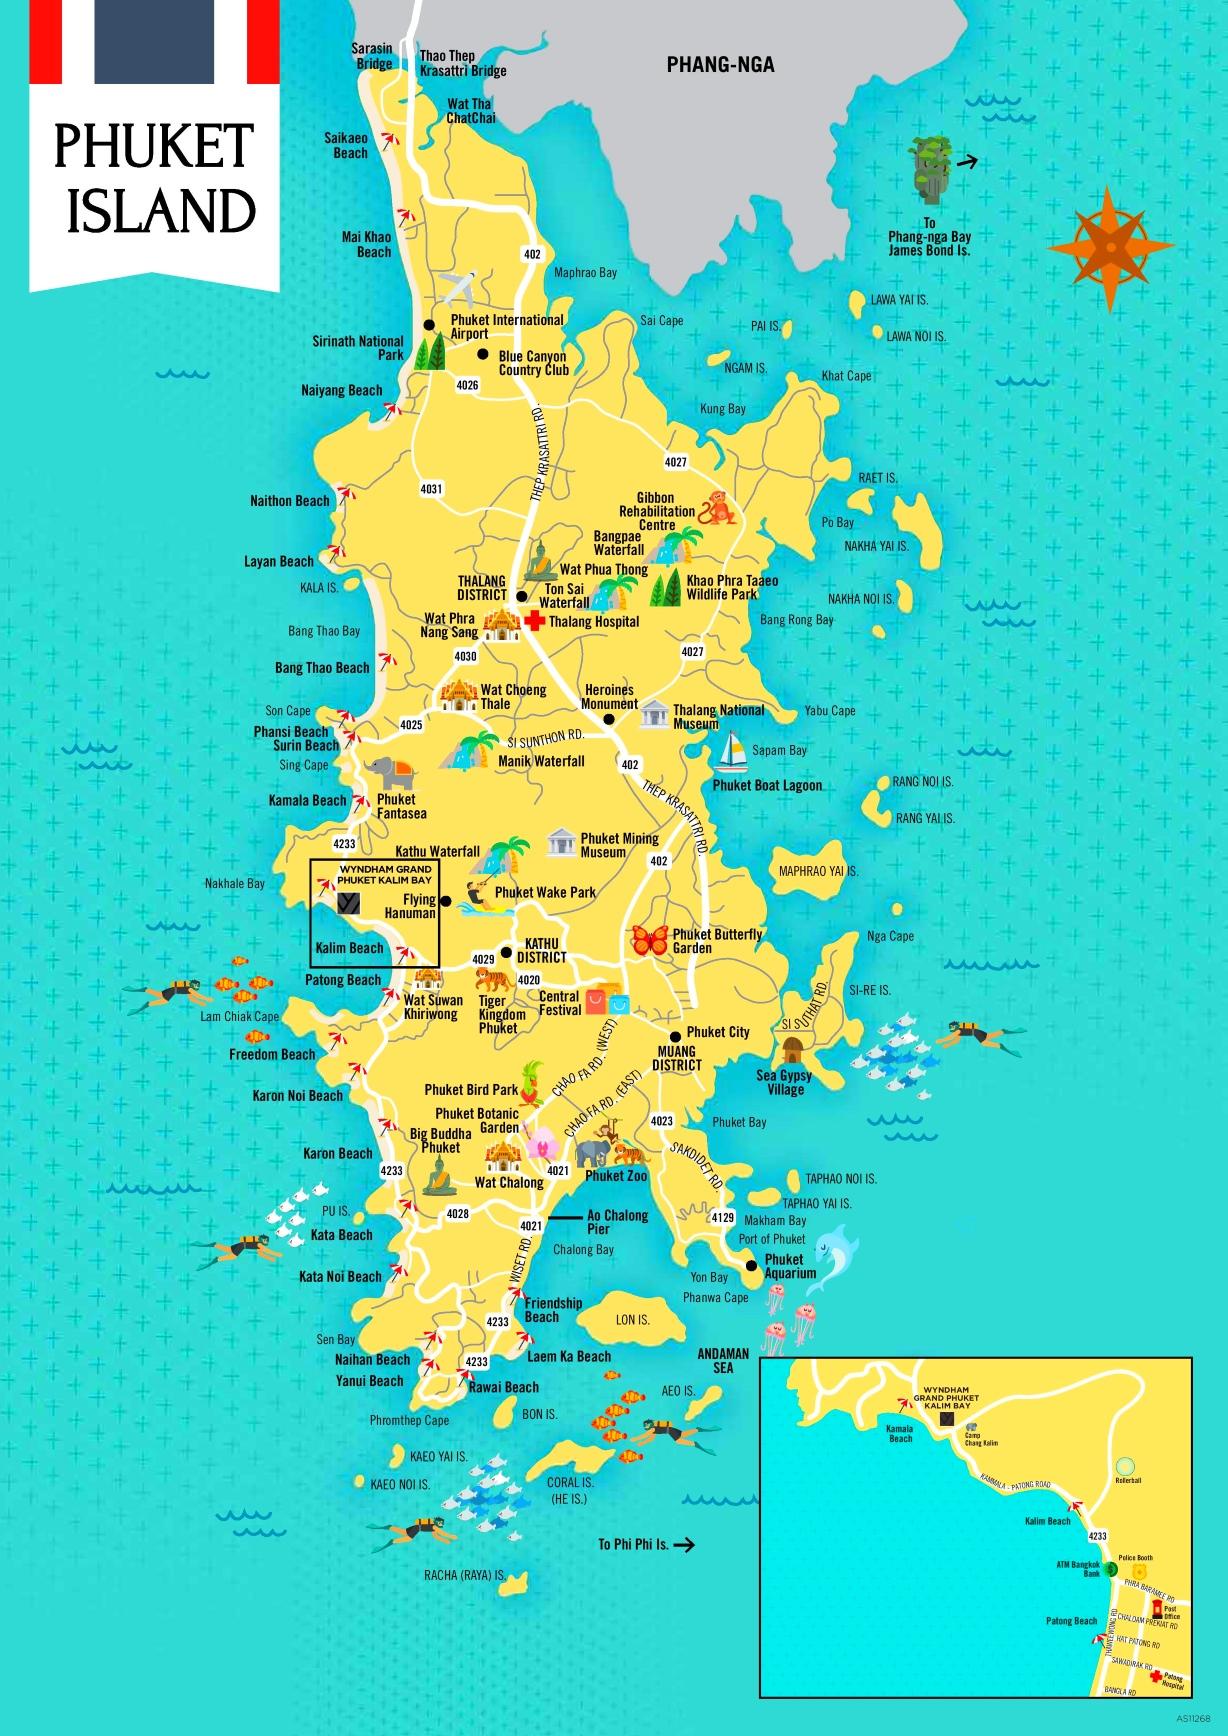 Map Of Phuket Phuket tourist attractions map Map Of Phuket